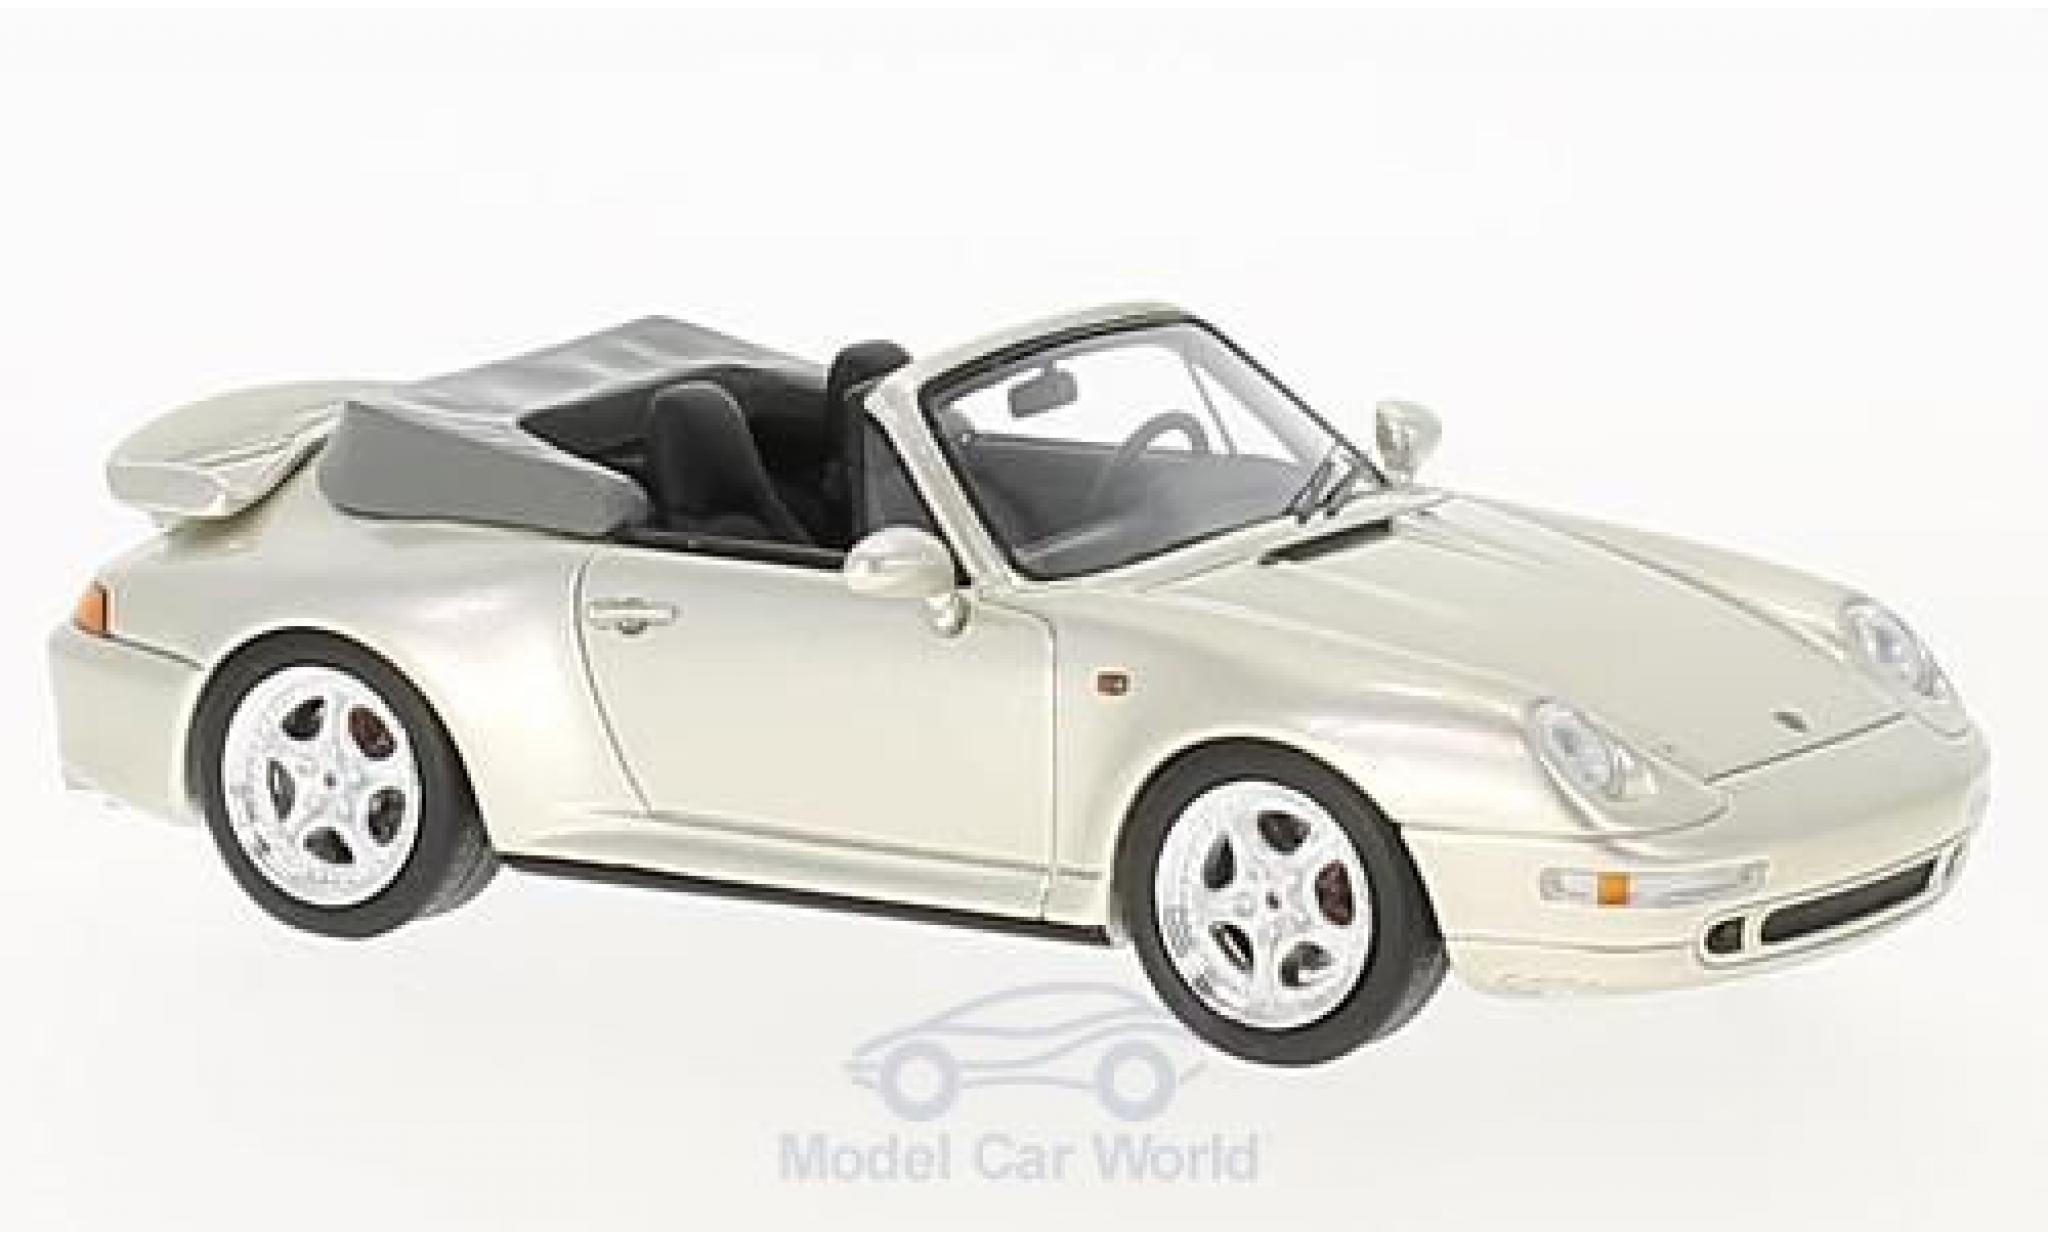 Porsche 993 Turbo 1/43 Schuco ProR (993) Turbo Cabriolet metallic-beige